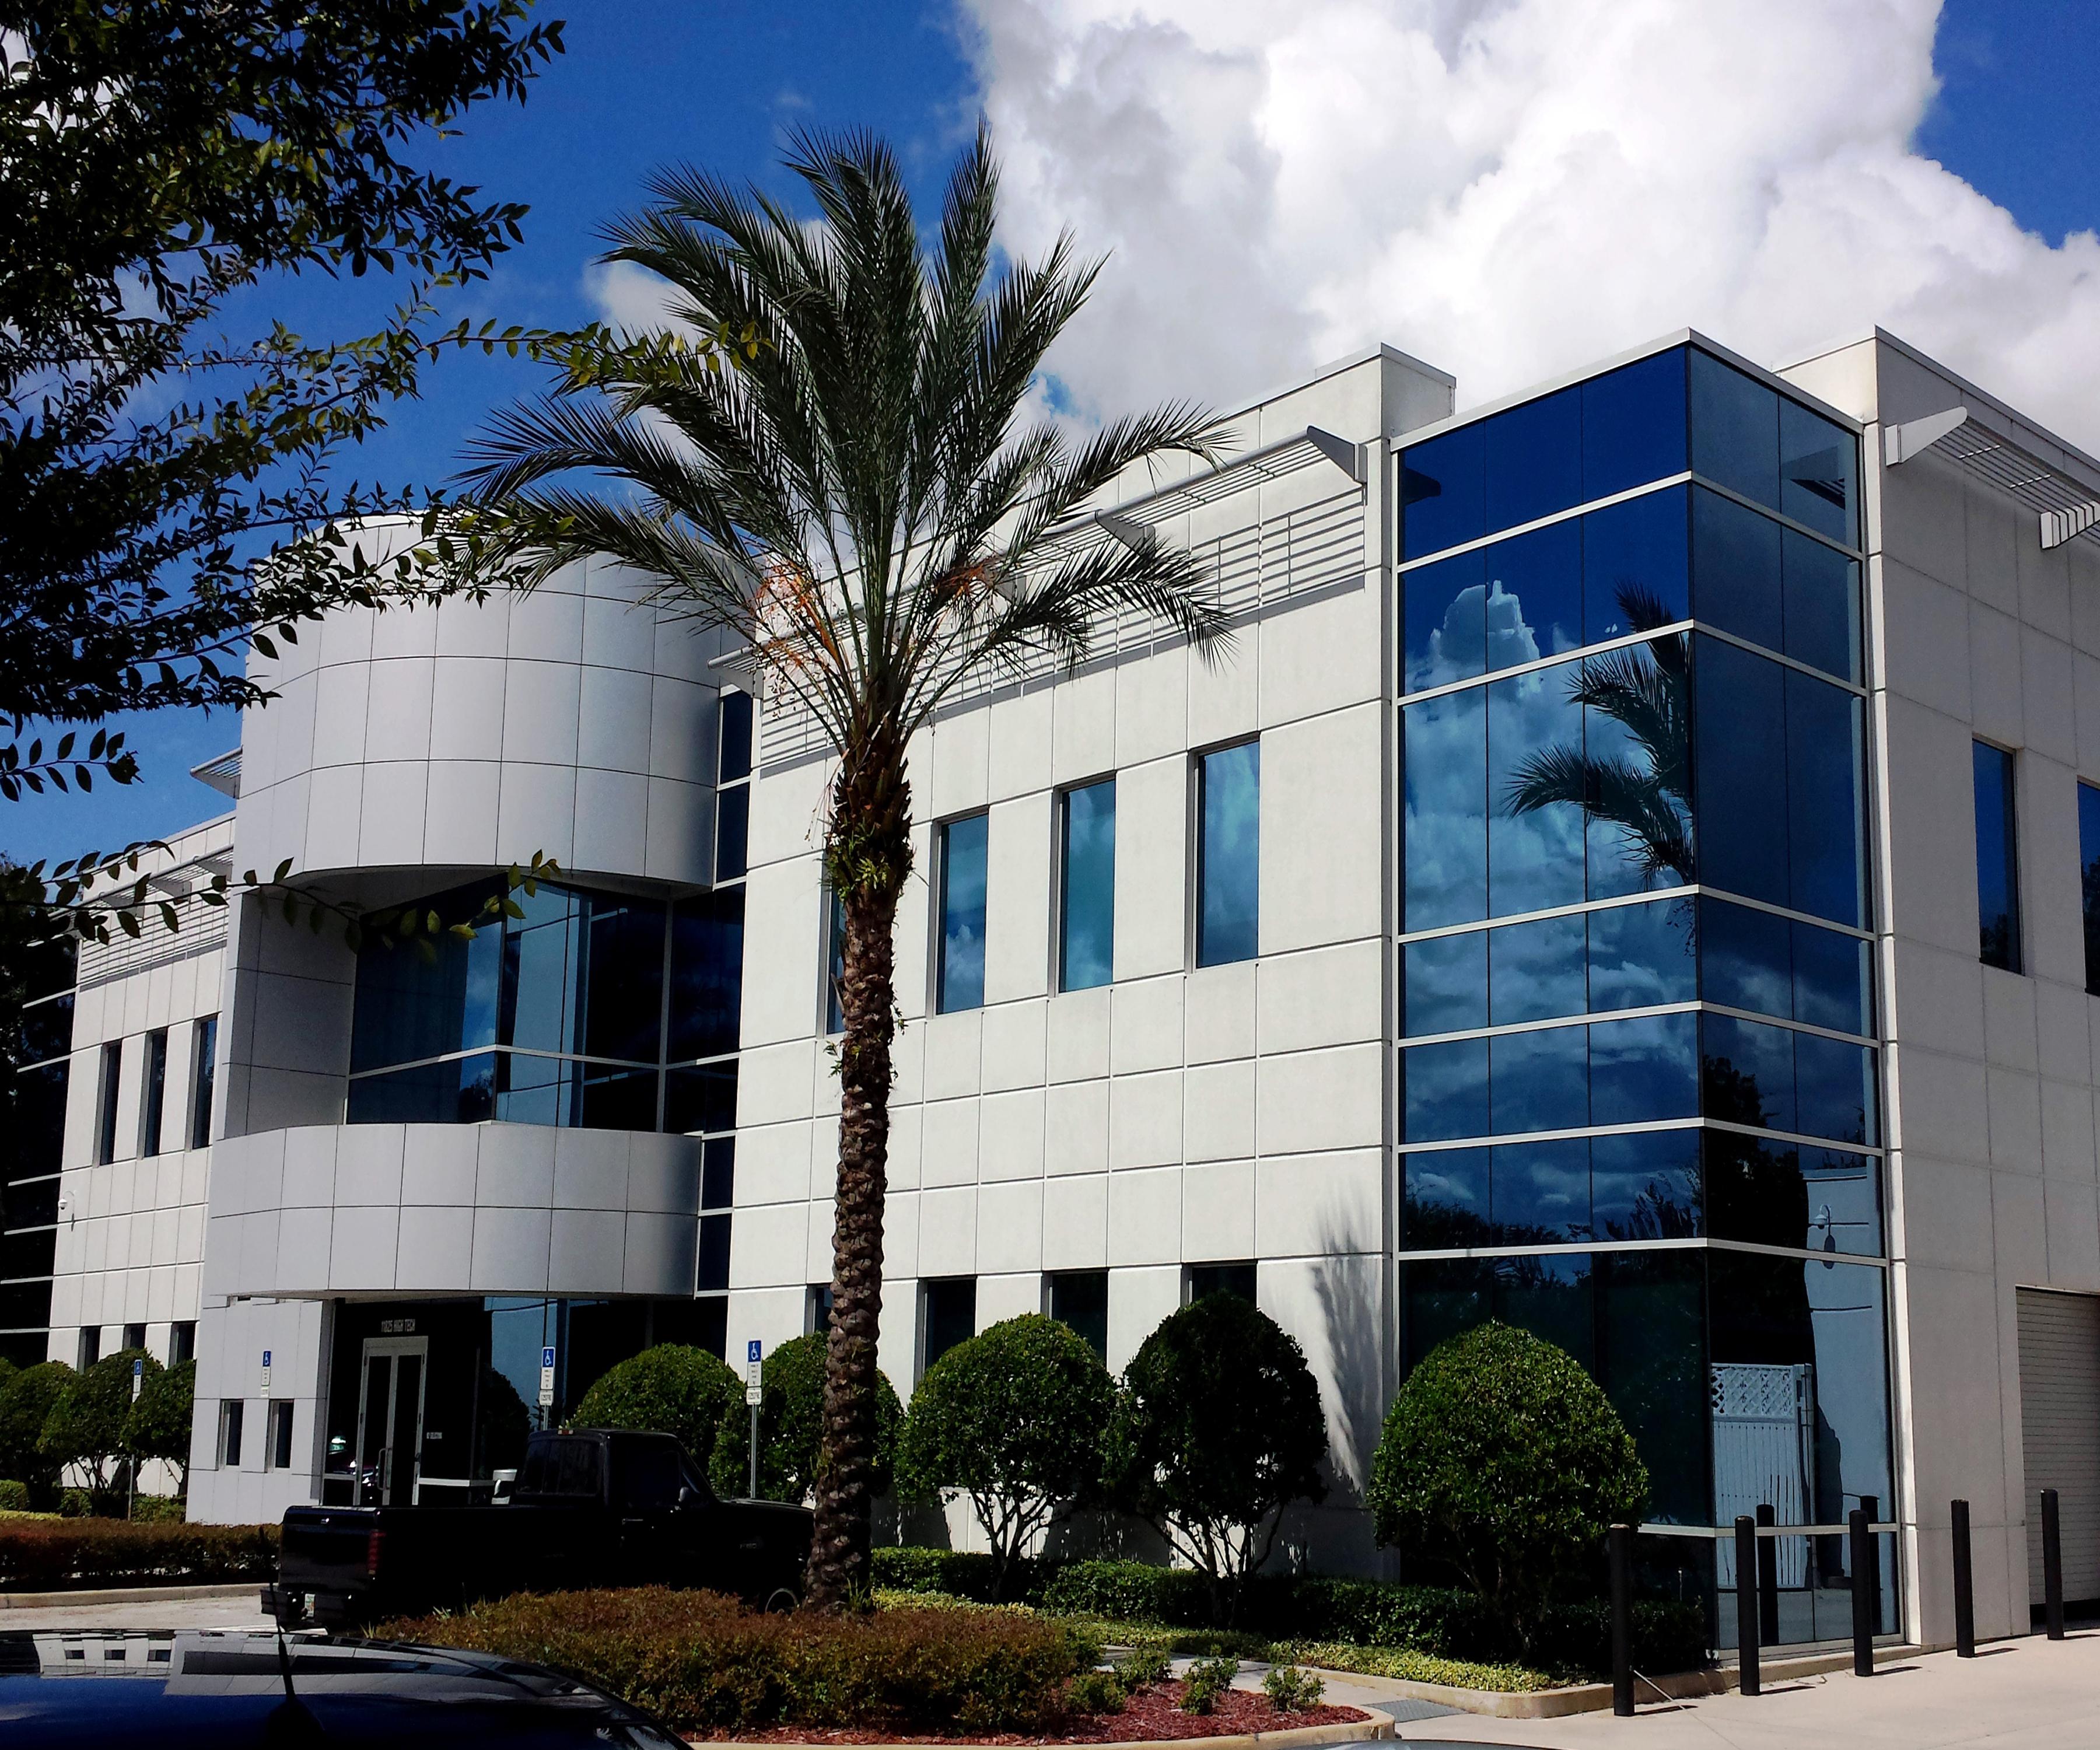 University Center at Quadrangle  16x20 edit